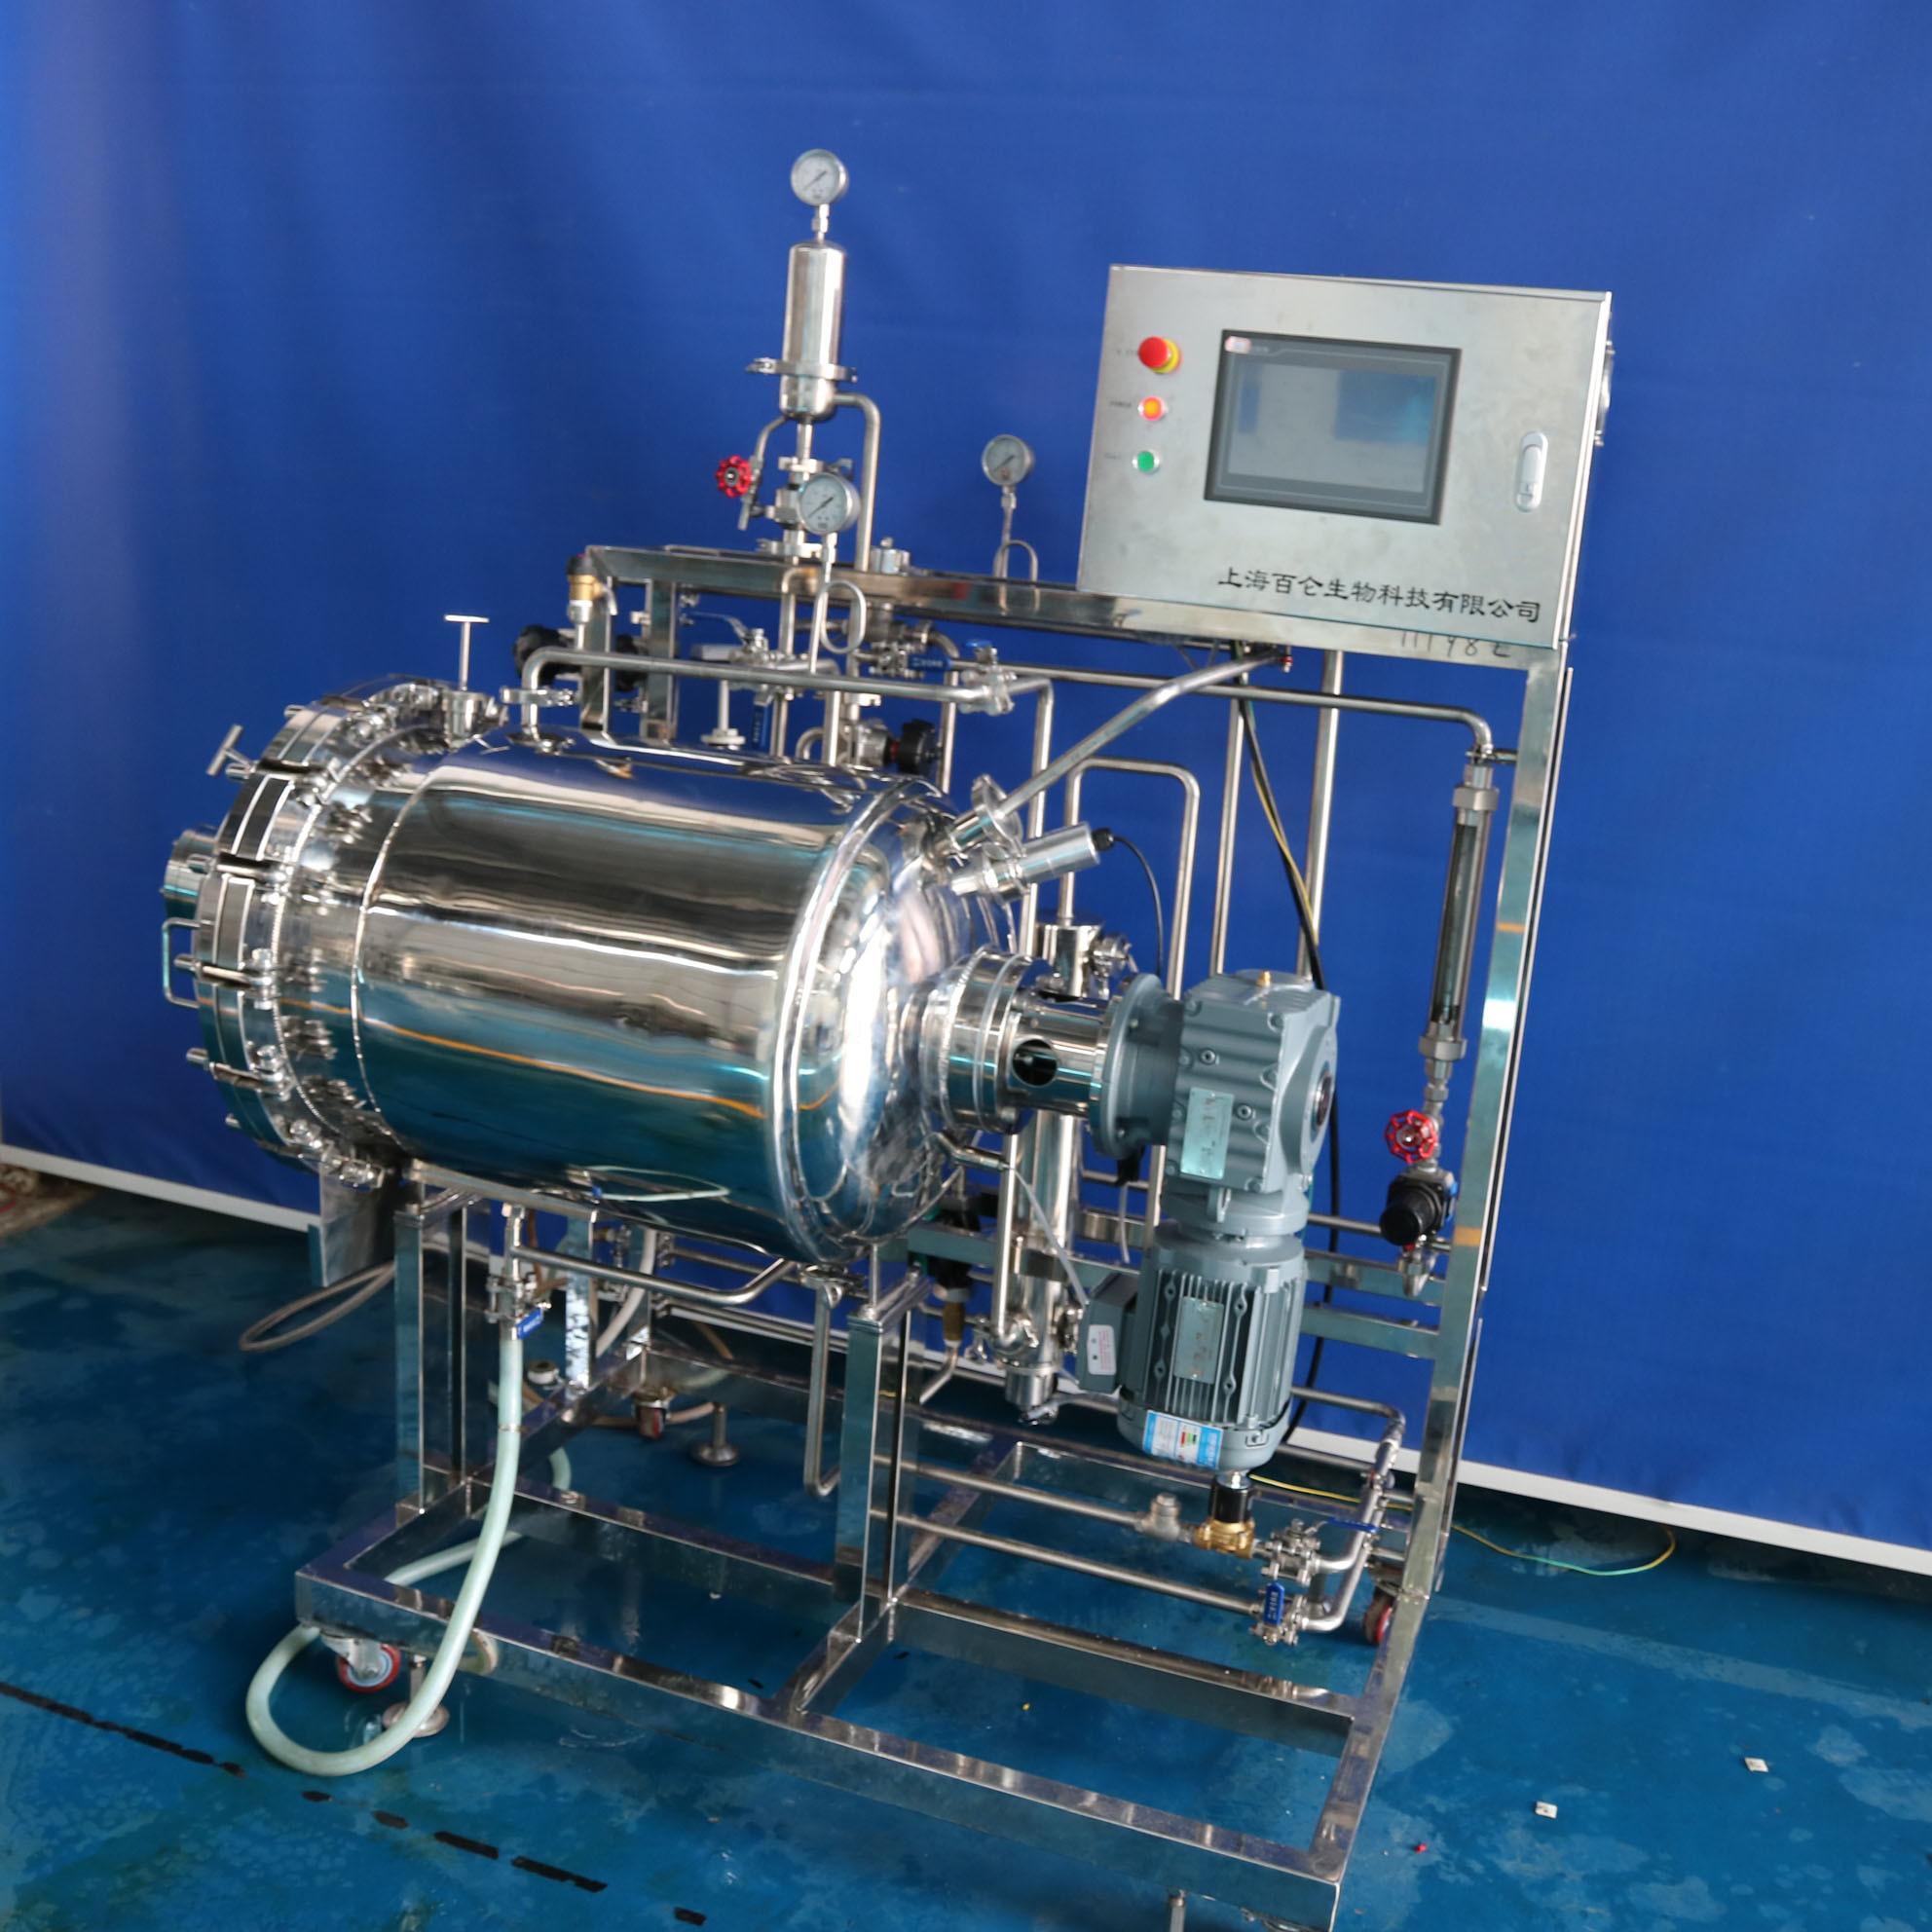 300 Liters Solid Fermenter